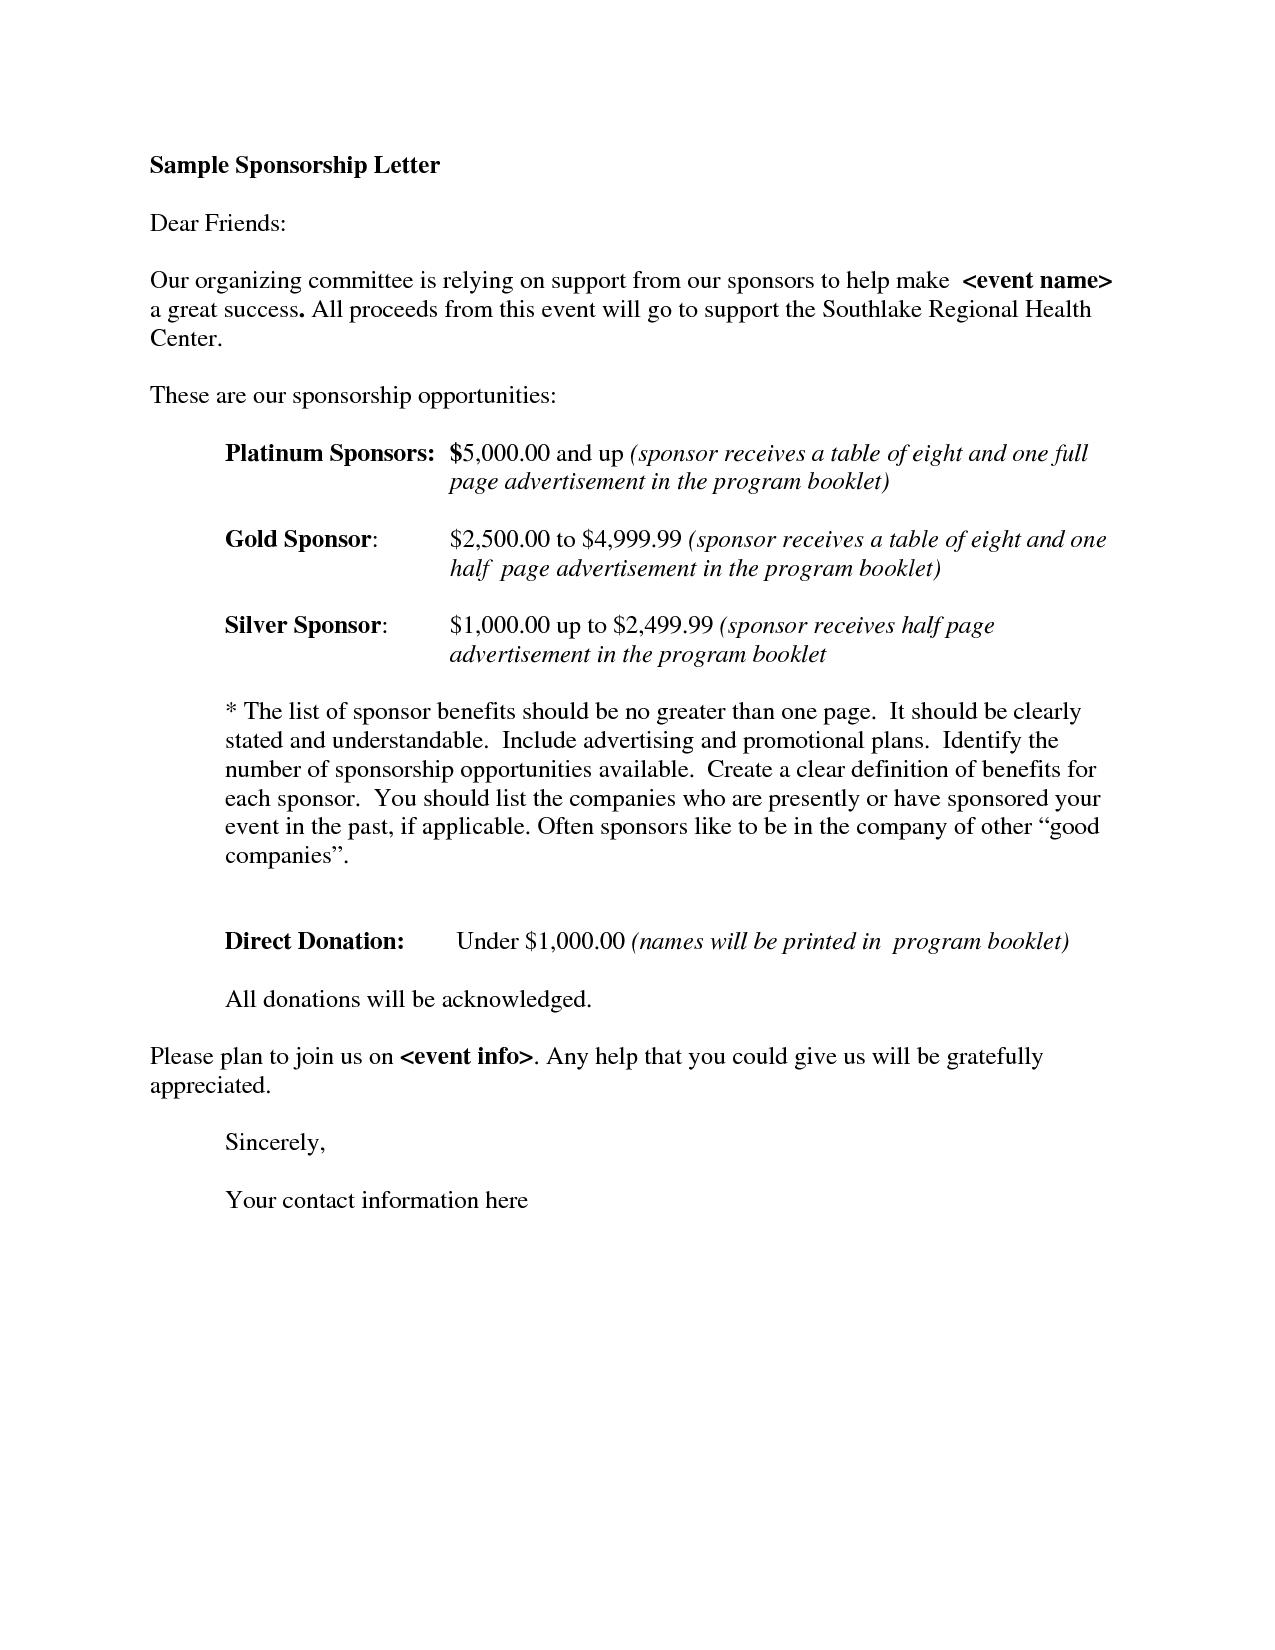 Sponsorship Letter Proposal 40 Sponsorship Letter